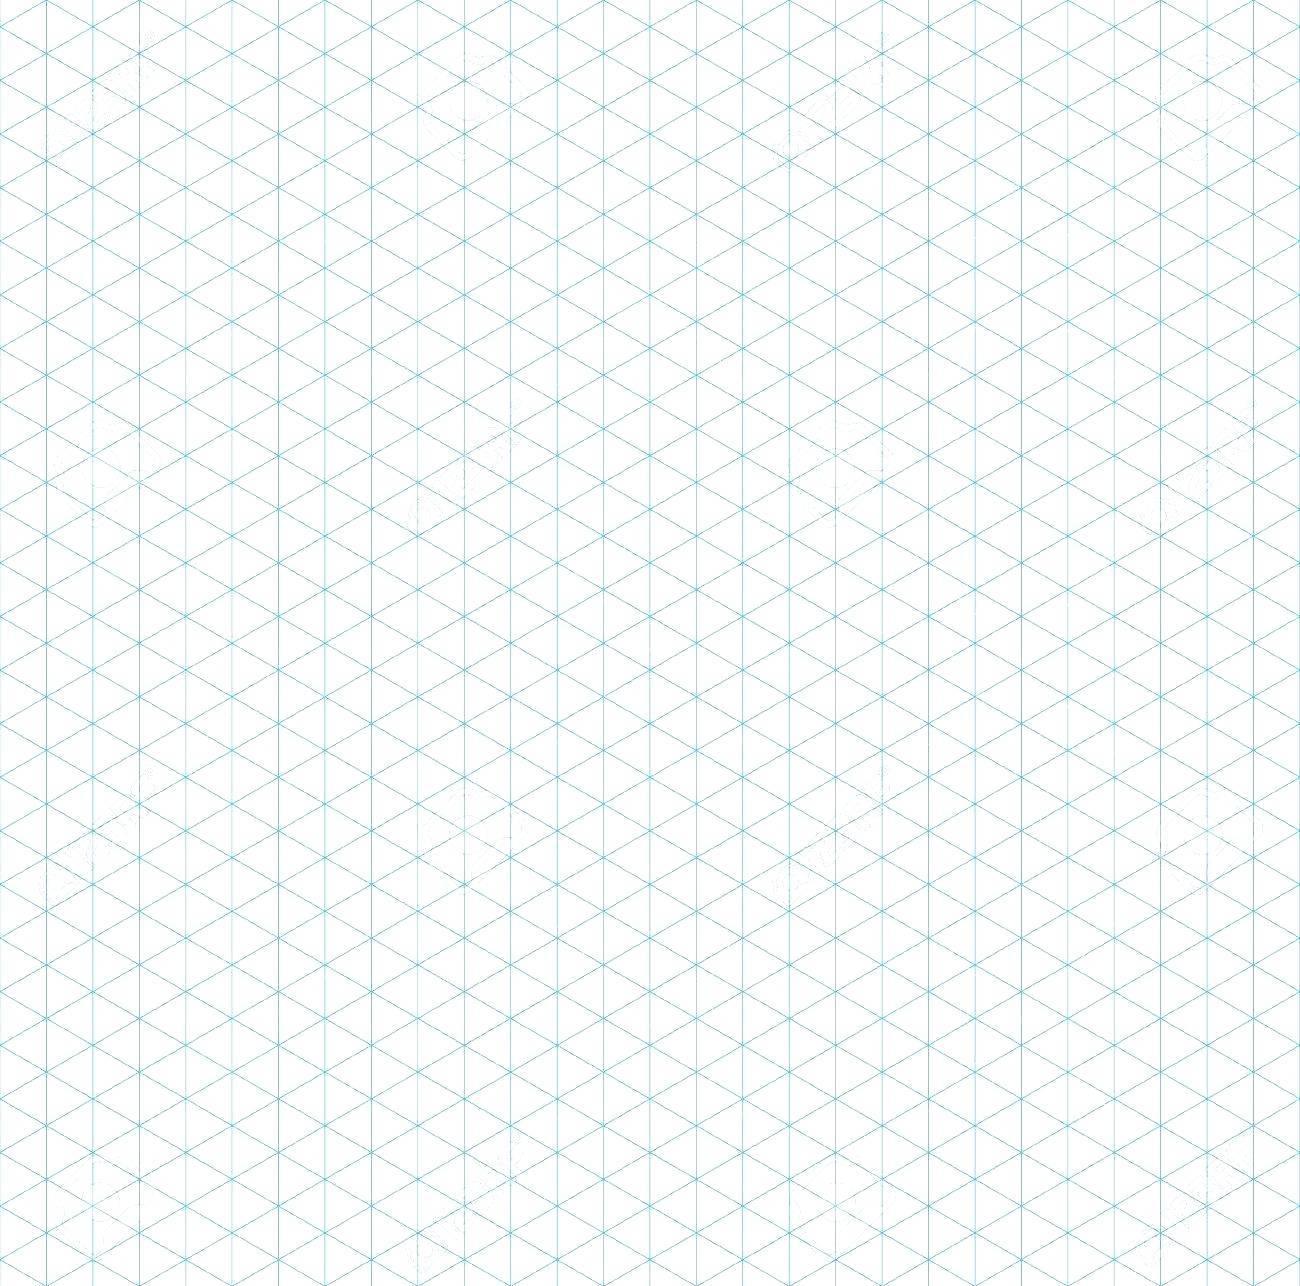 Isometric Grid Template Ai